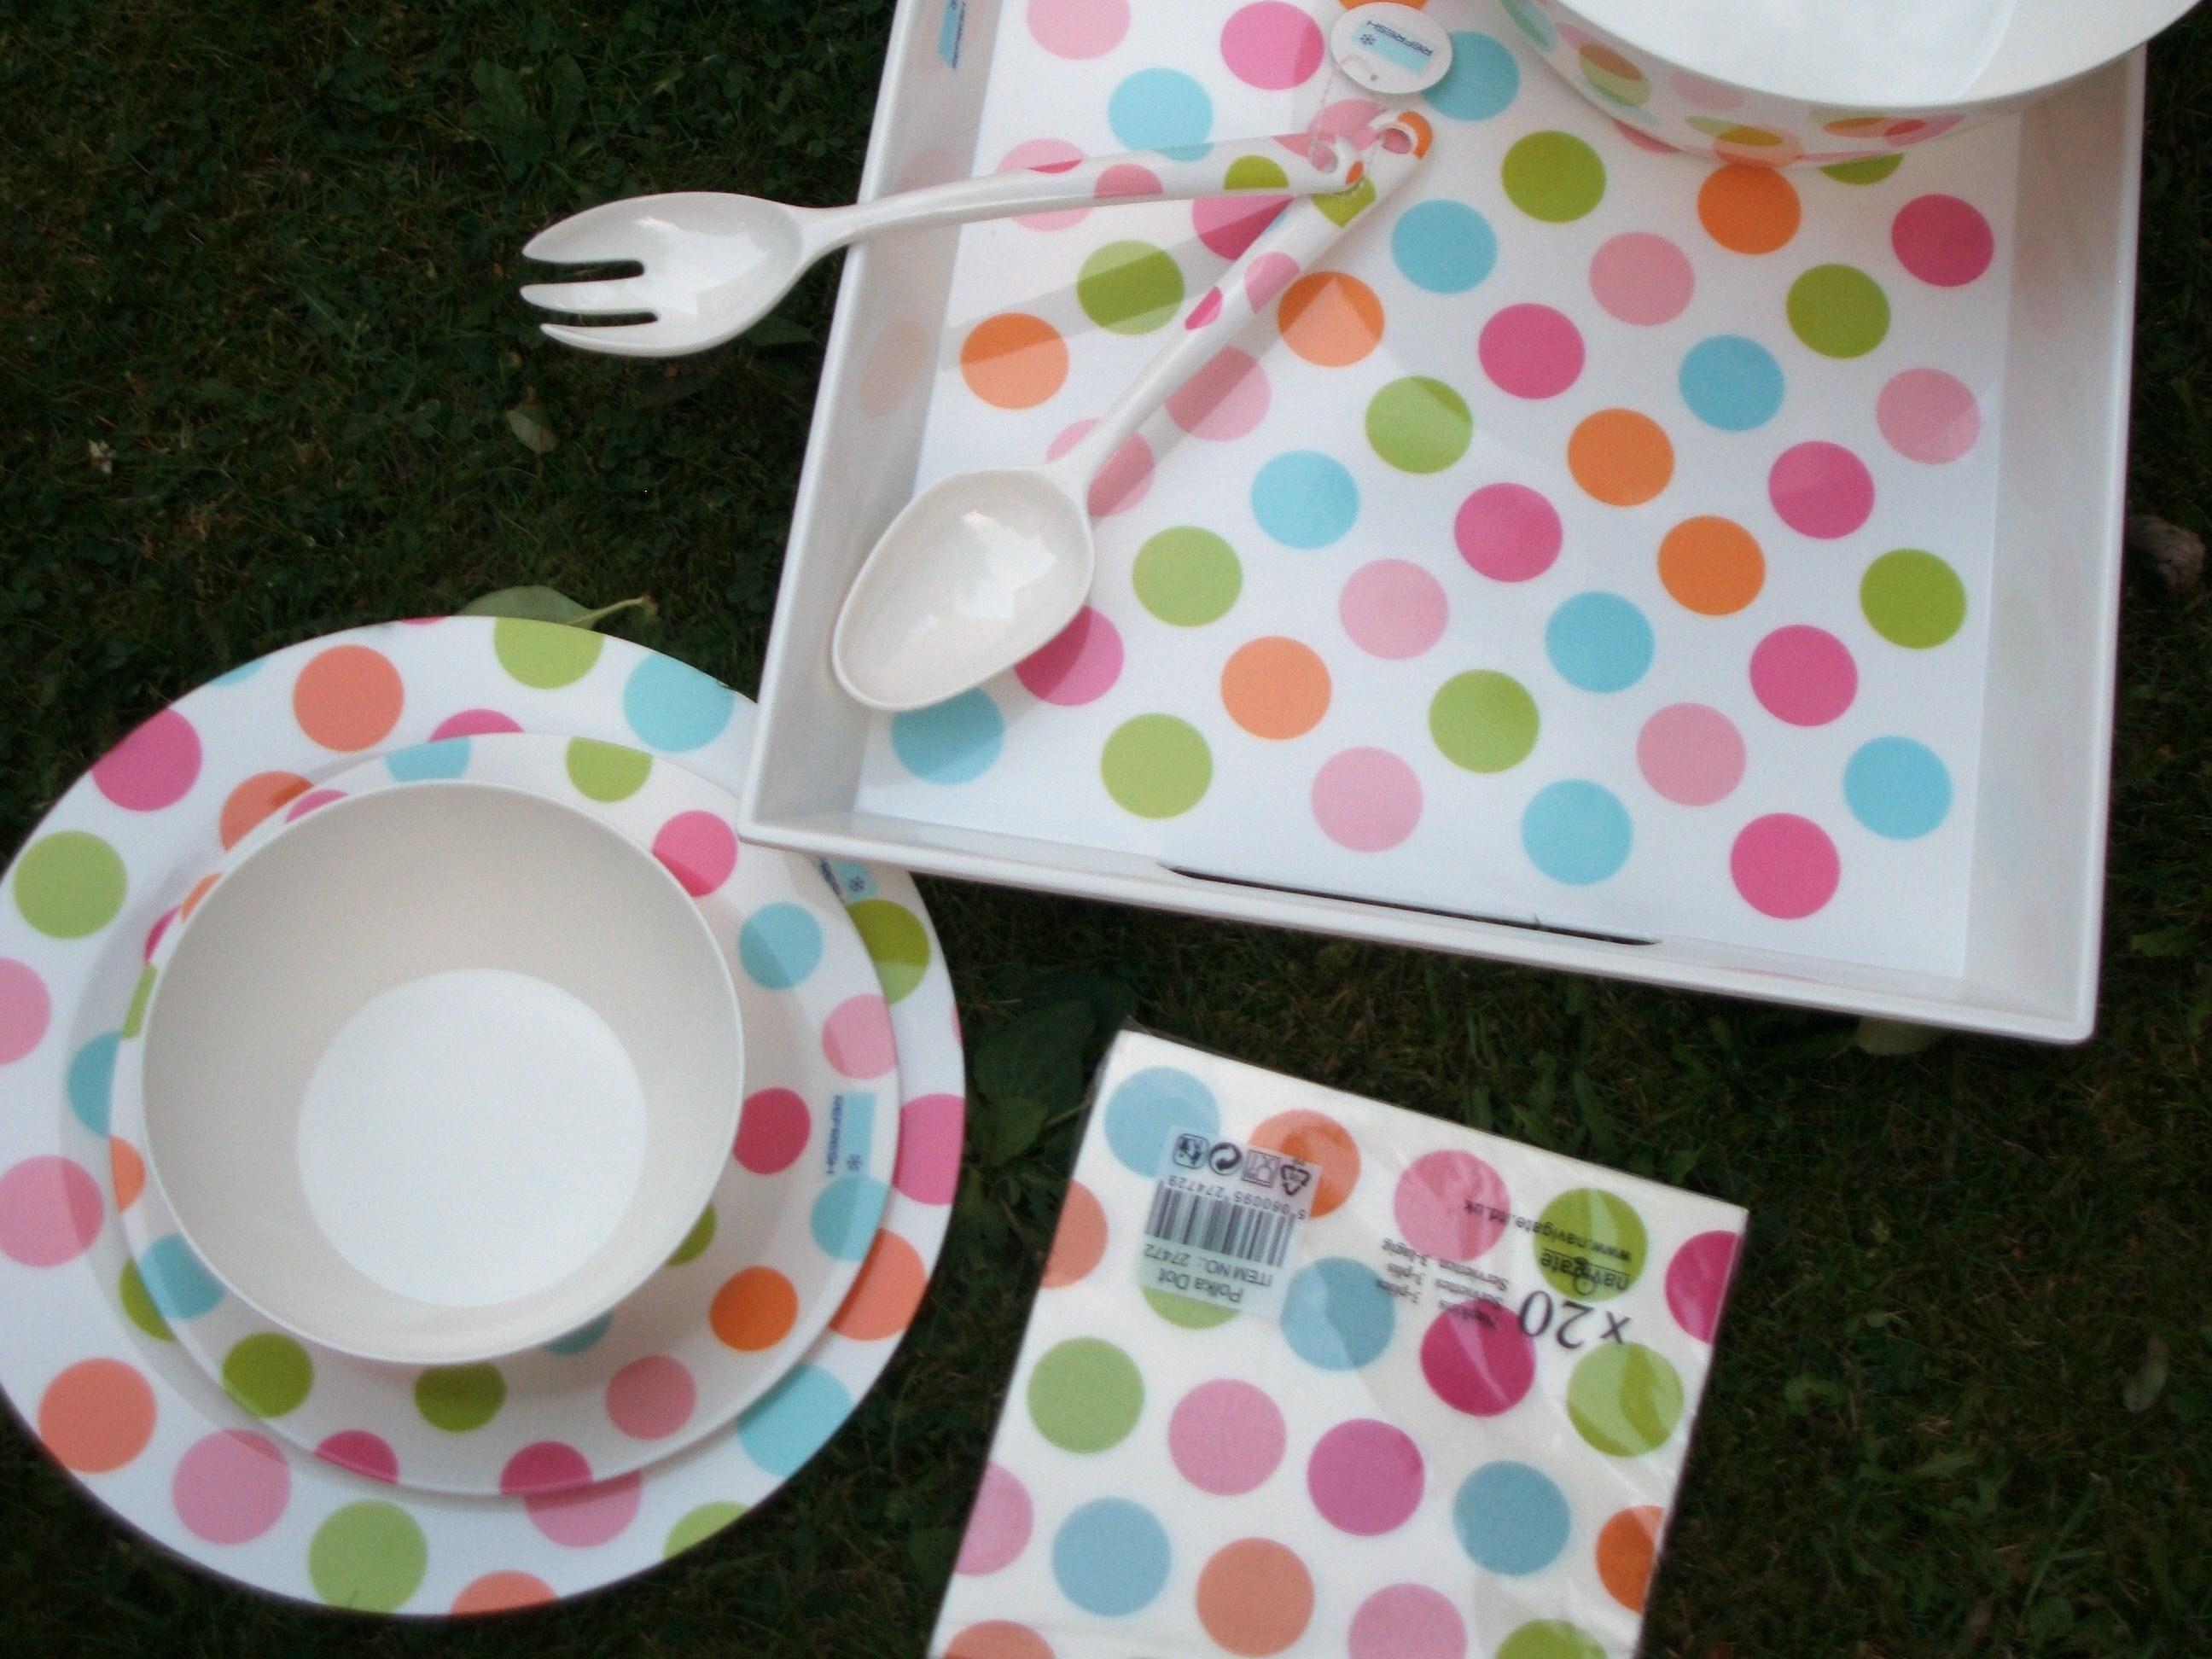 Polka dot picnicware on the ground